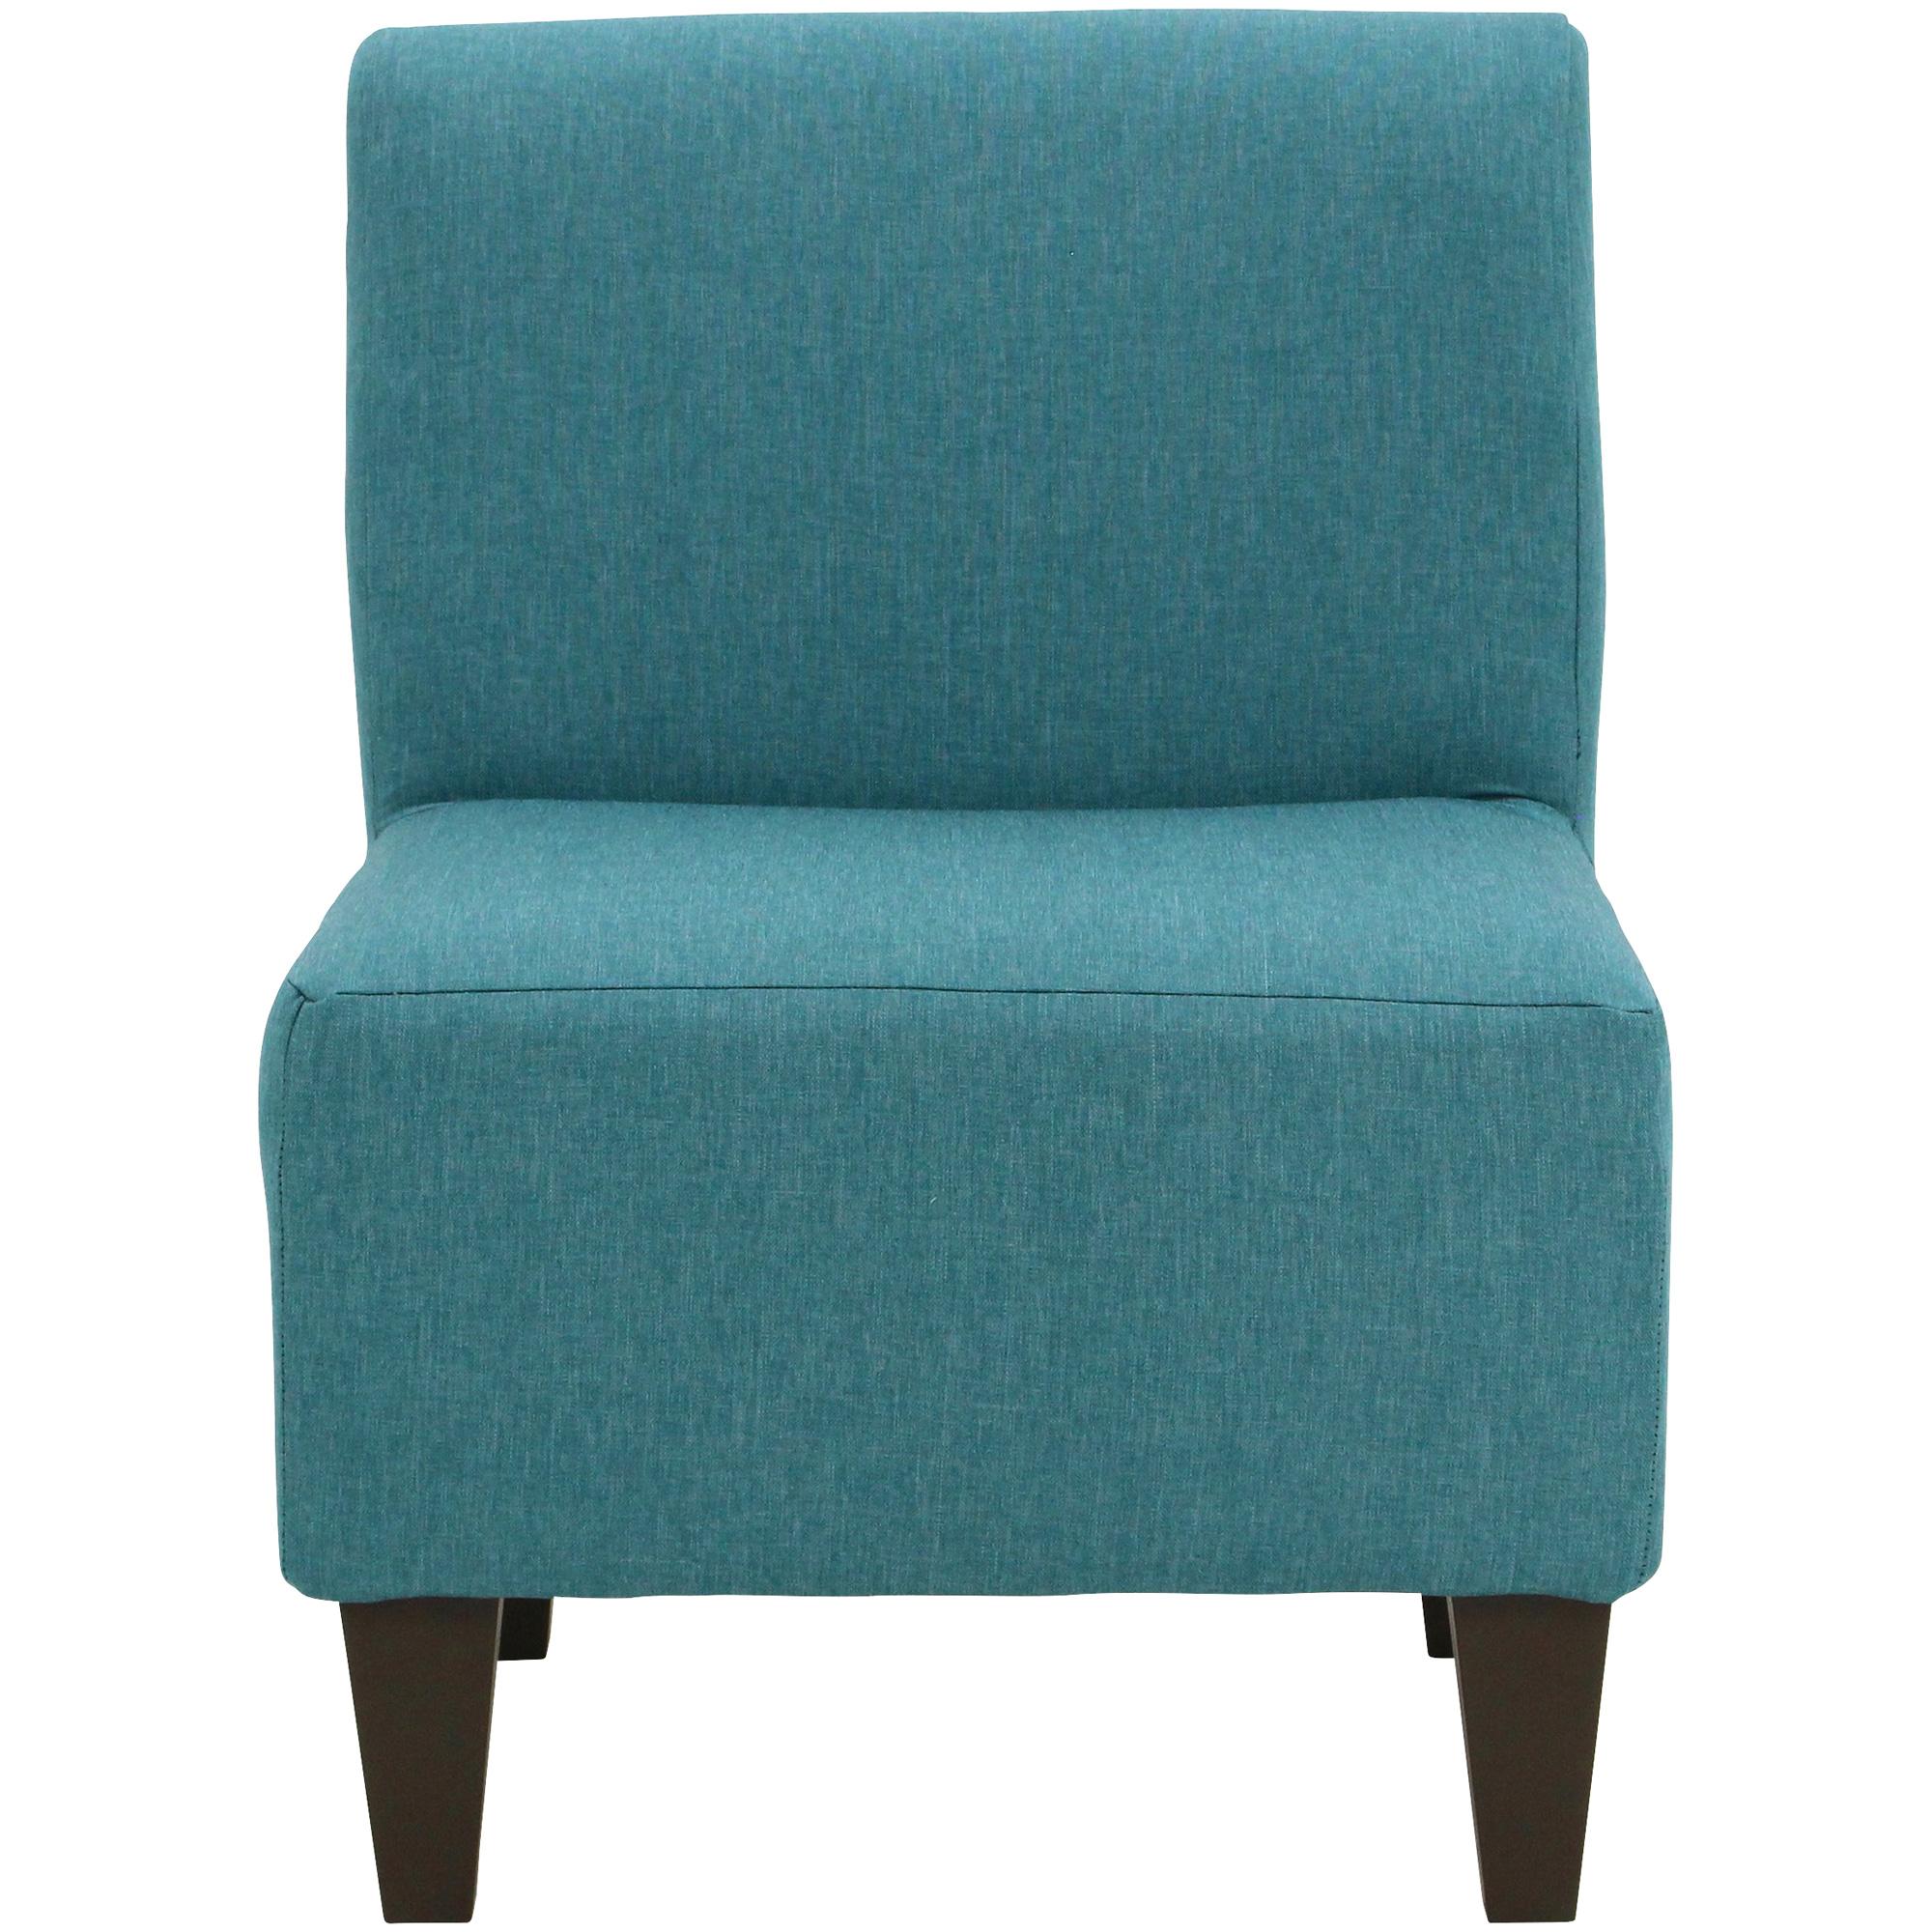 Overman | Amanda Caribbean Accent Chair